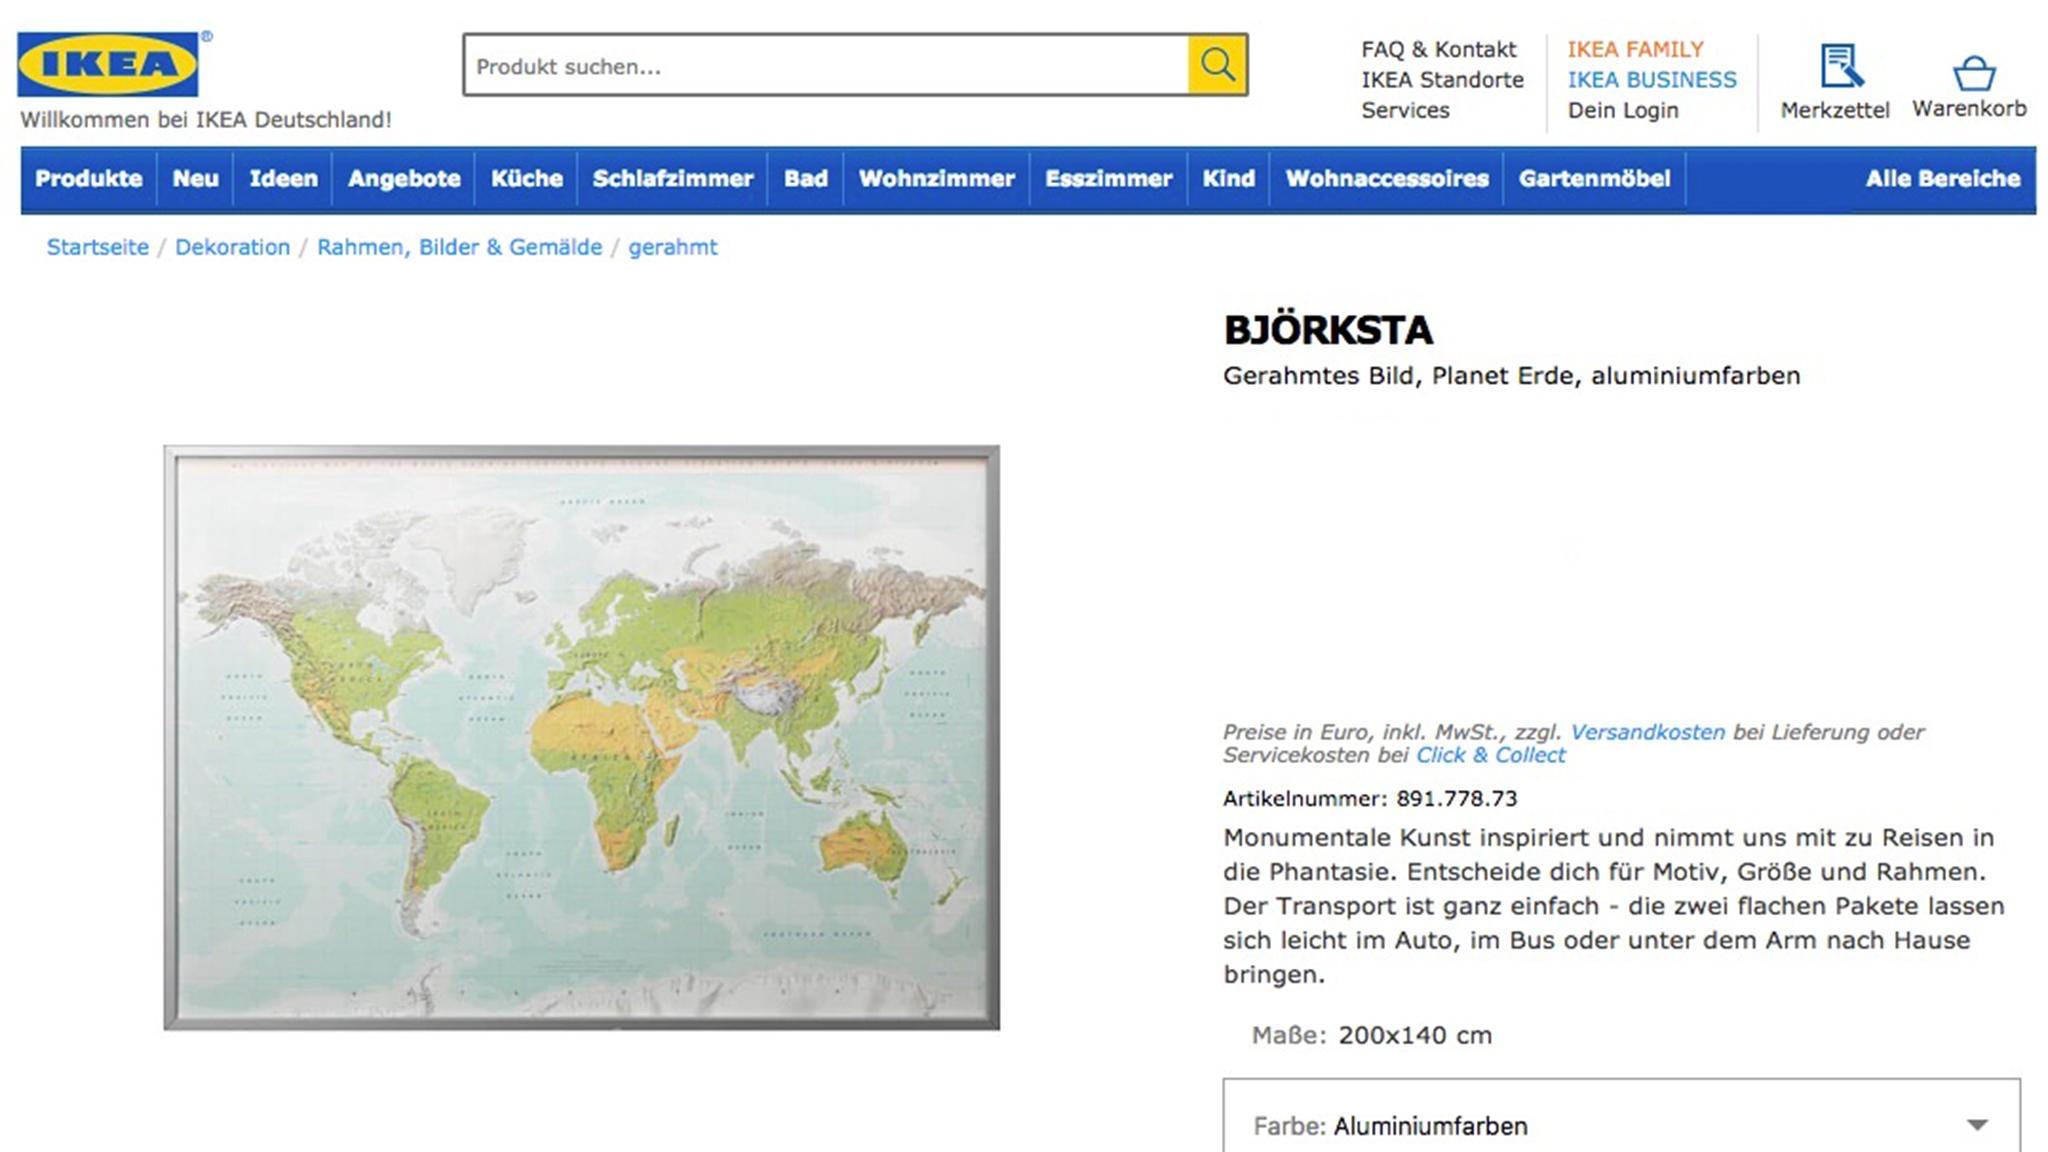 Björksta Ikea Vergisst Neuseeland Auf Karte Sternde